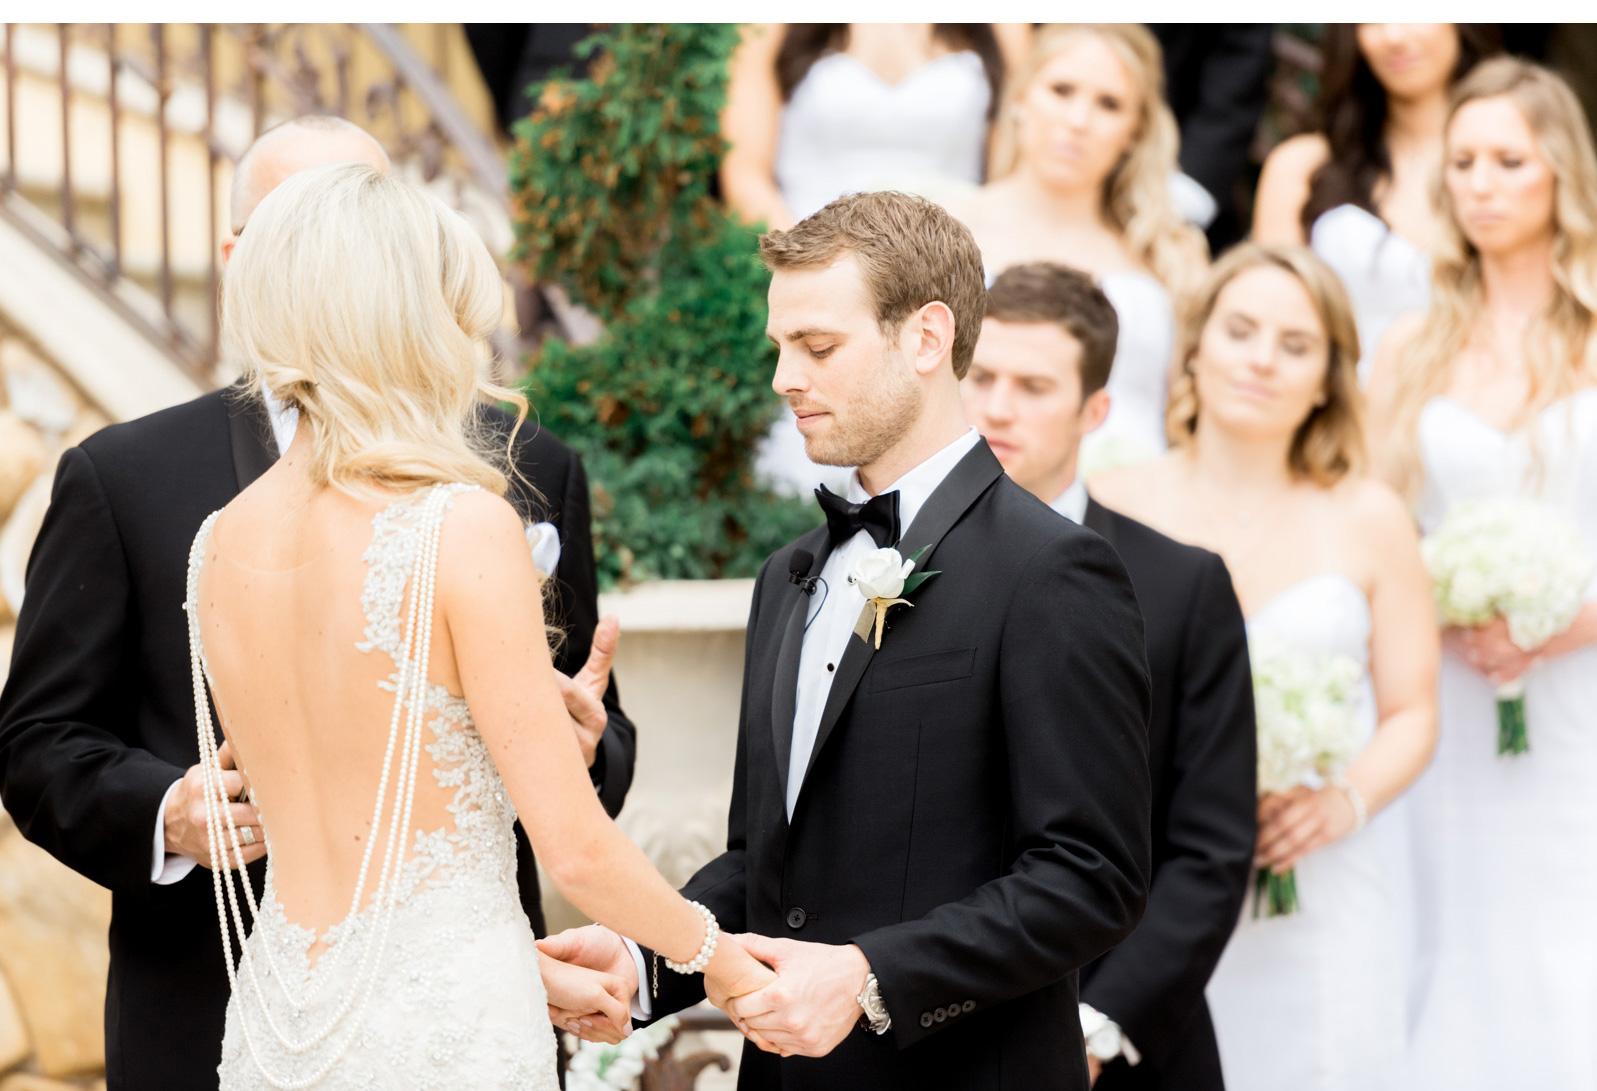 Southern-California-Wedding-Photographer-Natalie-Schutt-Photography_25.jpg